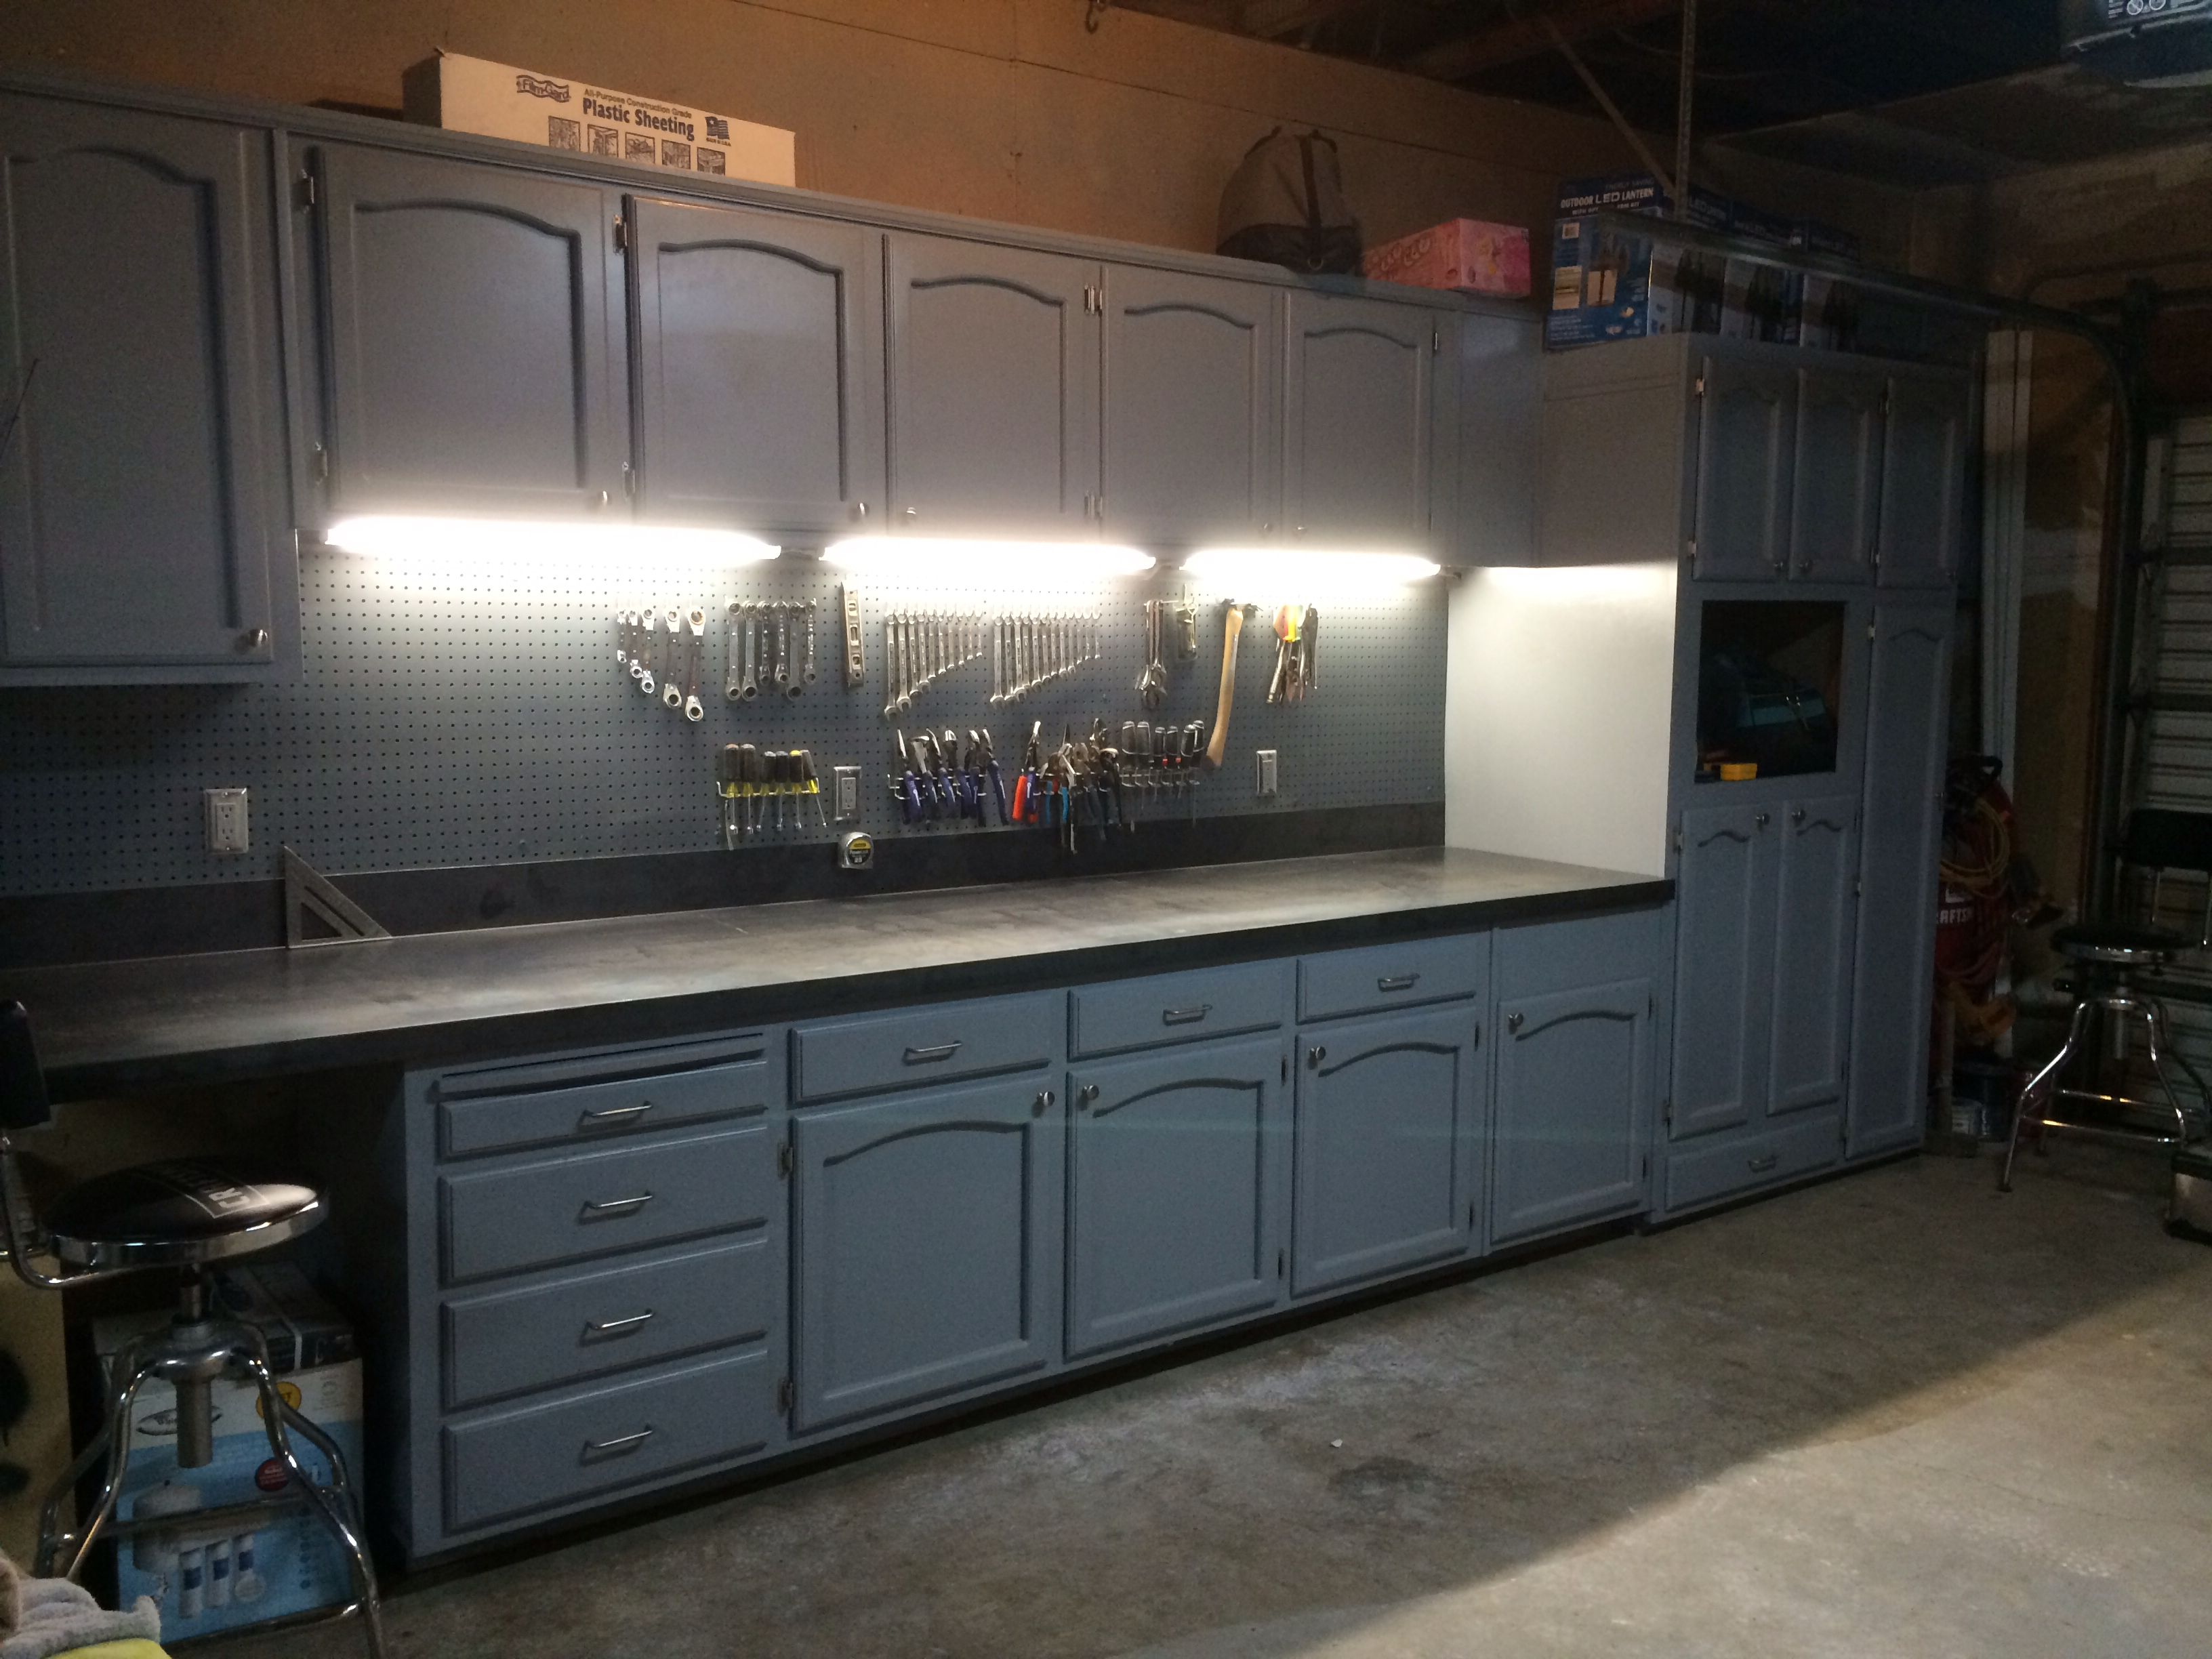 refurbished kitchen cabinets Refurbished kitchen cabinets for the ultimate work bench